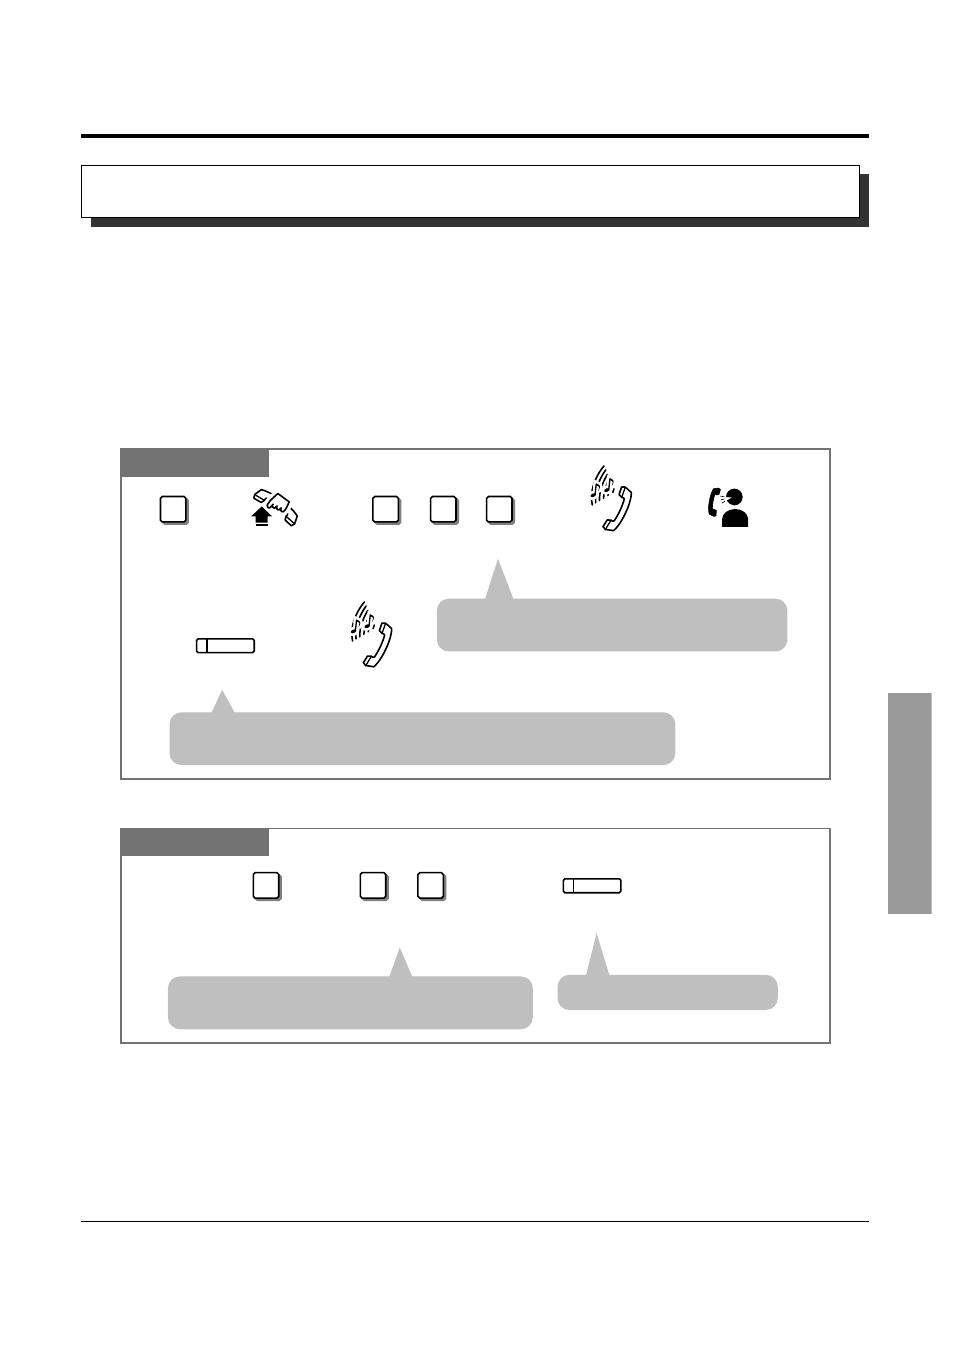 Manual de programacion panasonic kx ta308 pdf.